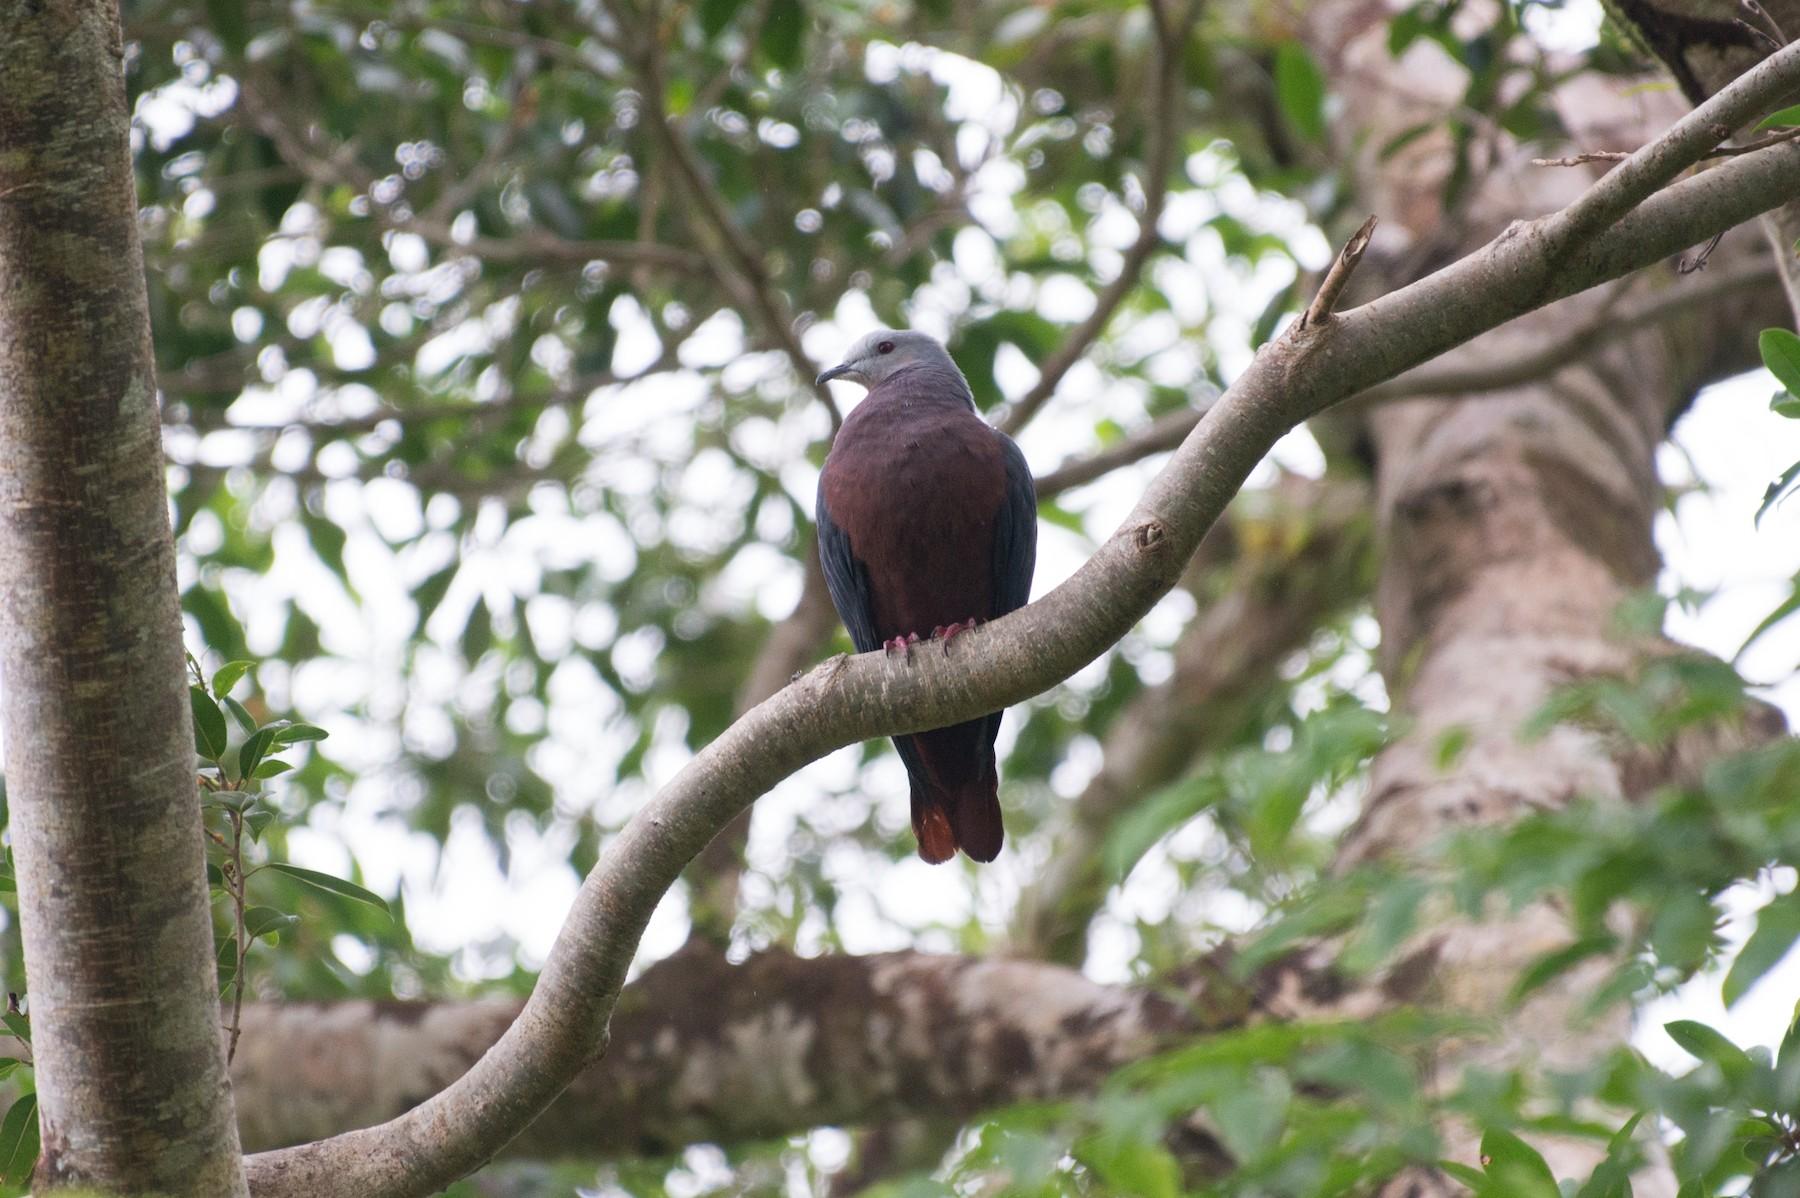 Chestnut-bellied Imperial-Pigeon - John C. Mittermeier